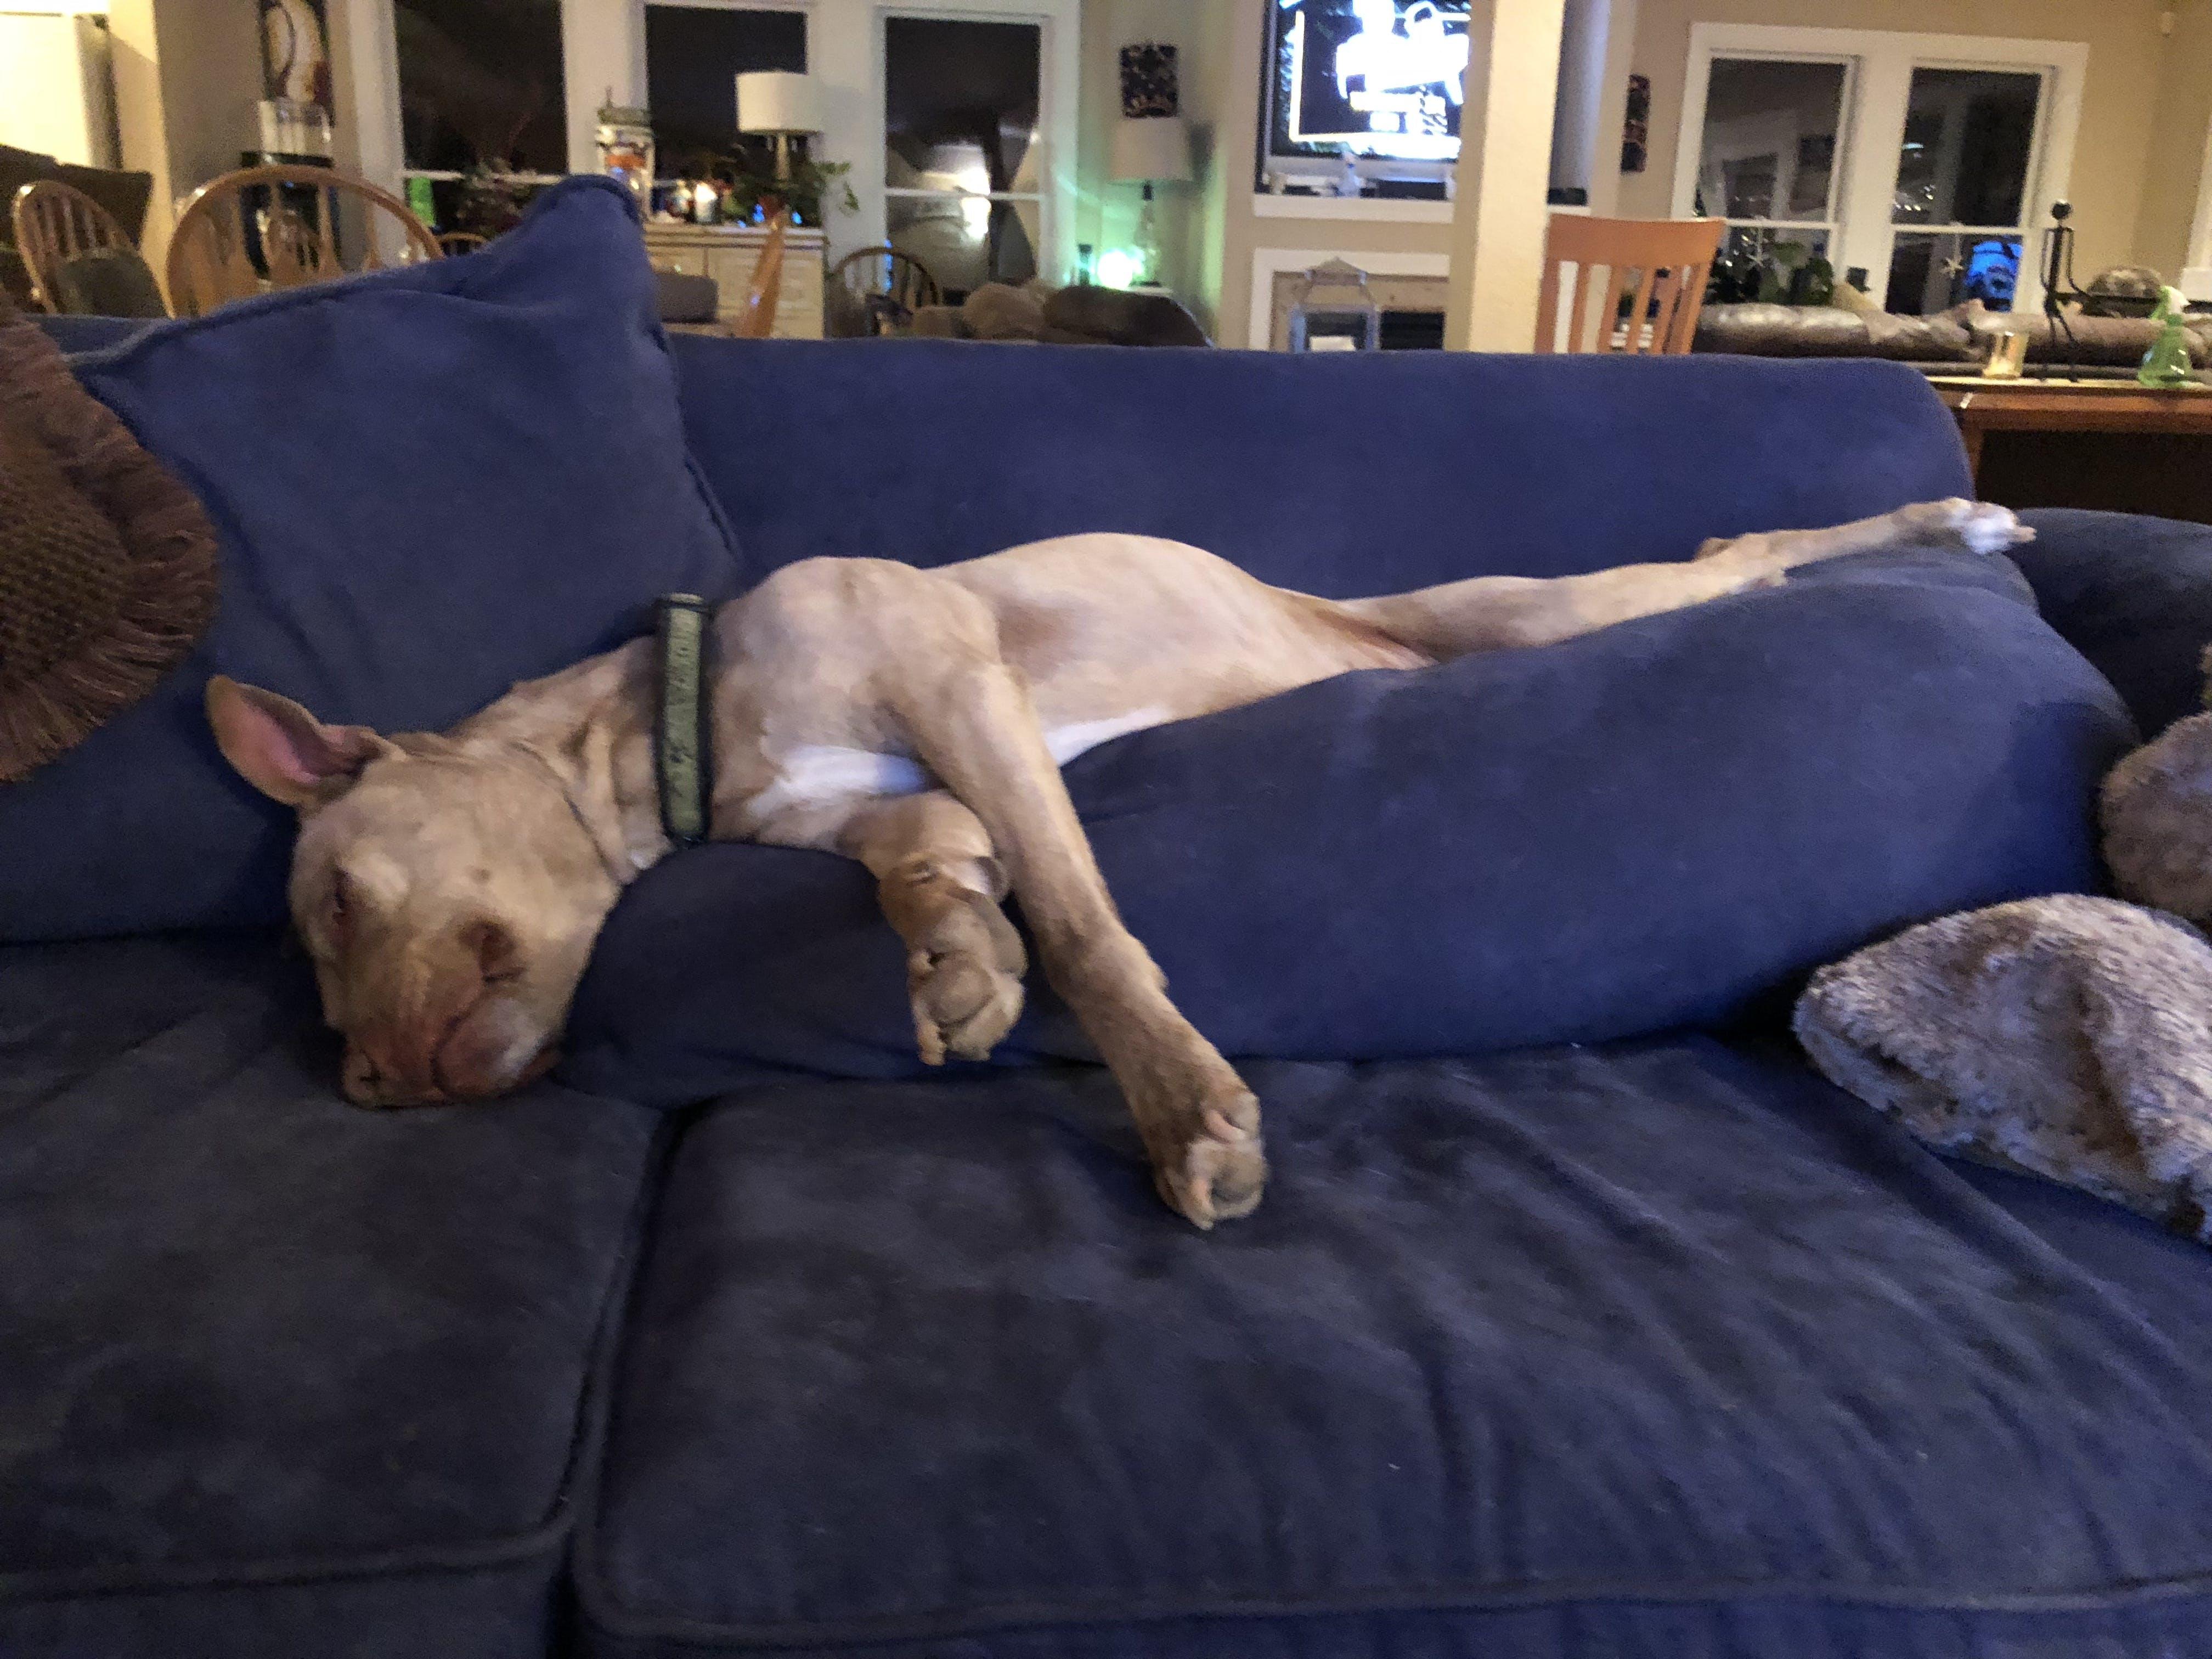 Free stock photo of dog, Pitt bull, sleeping dog